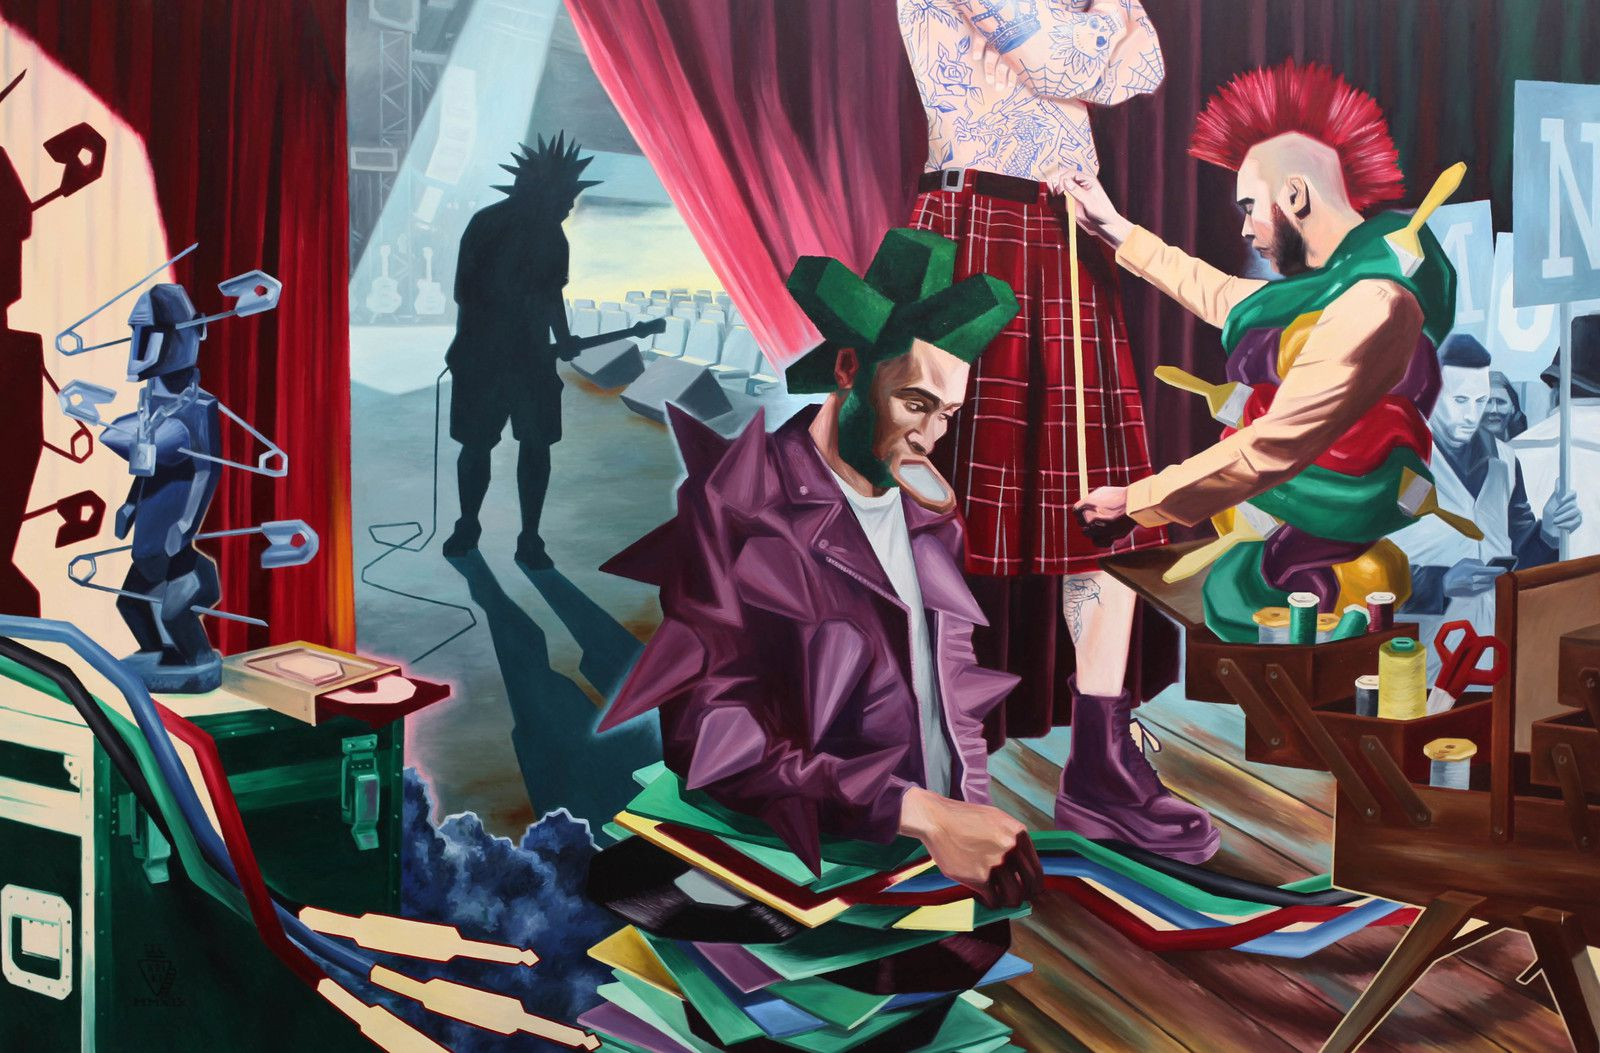 """Punkitude"", 2019 de KRIKI - Courtesy de l'artiste et de la galerie Galerie Suzanne TARASIEVE  Photo Éric Simon"